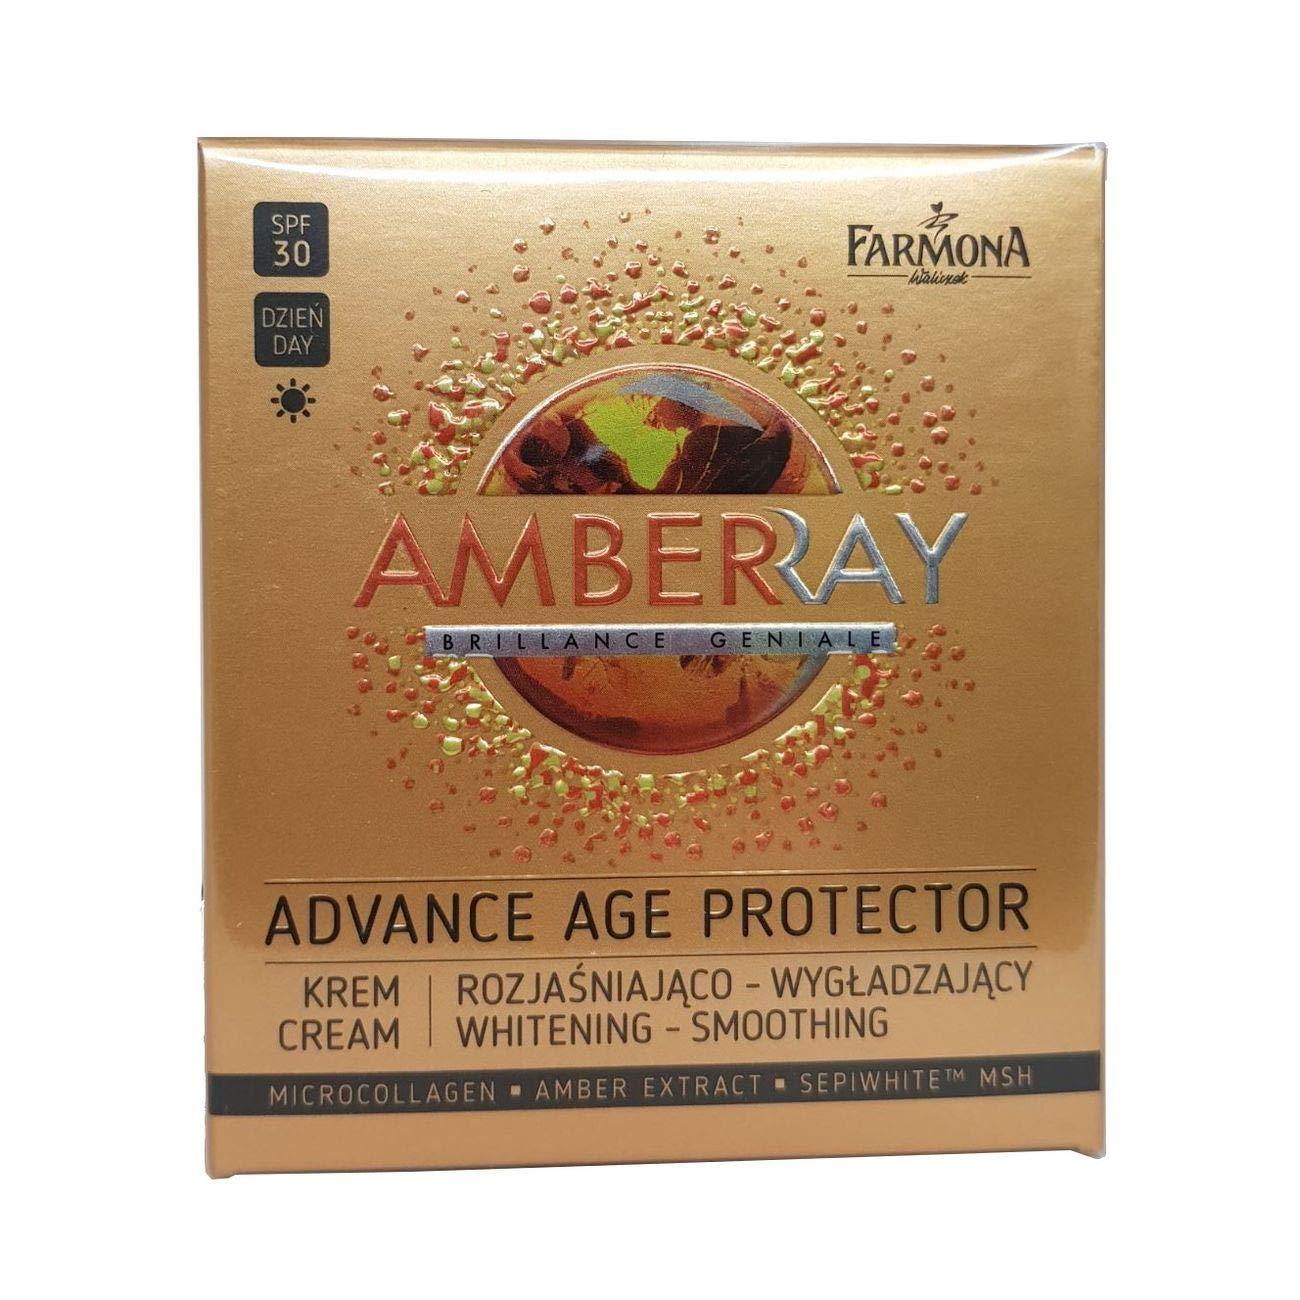 Farmona Amberray Advance Age Protector SPF30 Whitening-Smoothing Day Cream 50ml